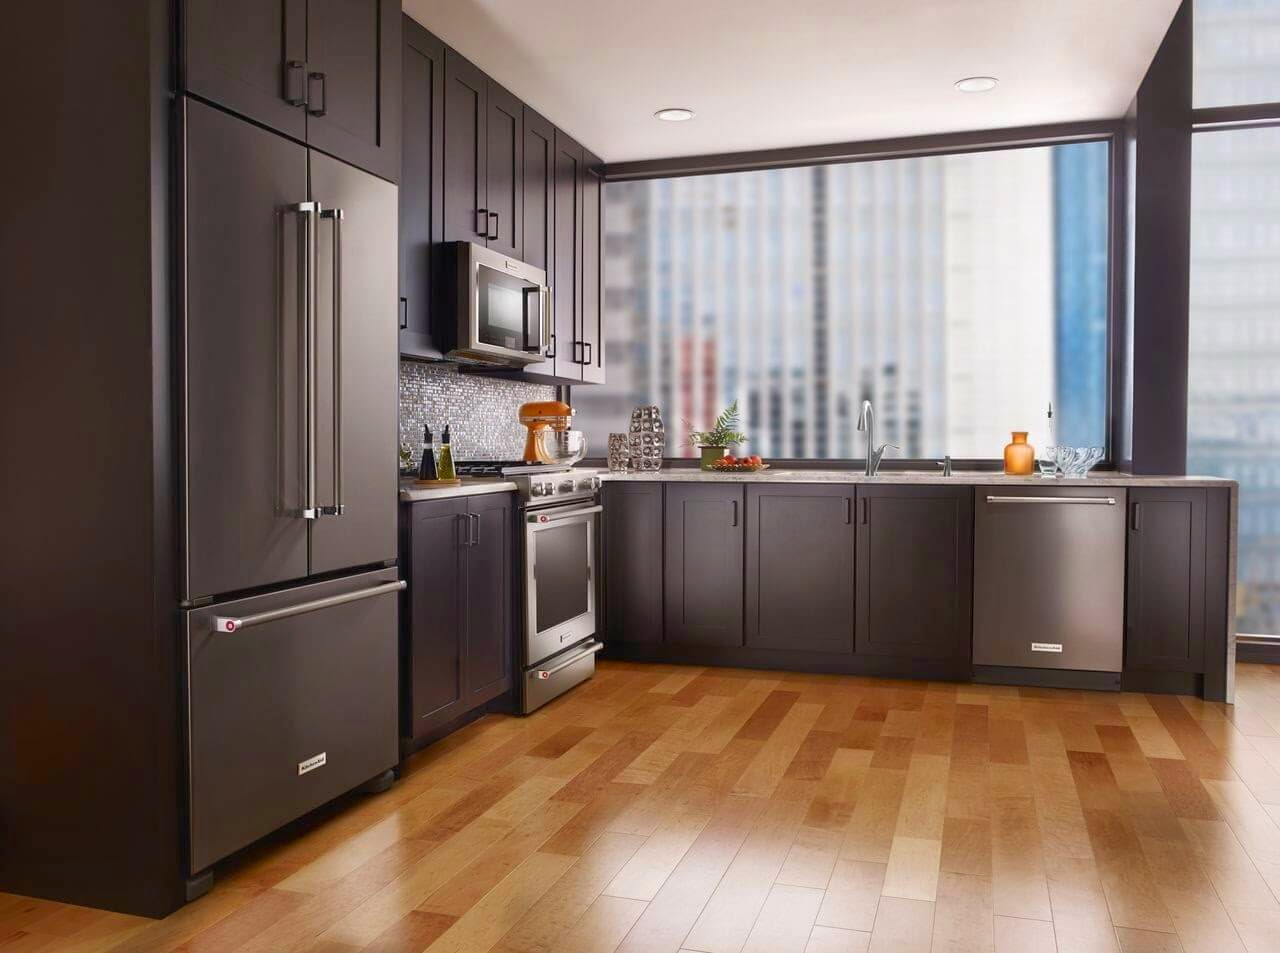 Modern Kitchen Appliances Shown In Kitchen Fridge Stove Dishwasher